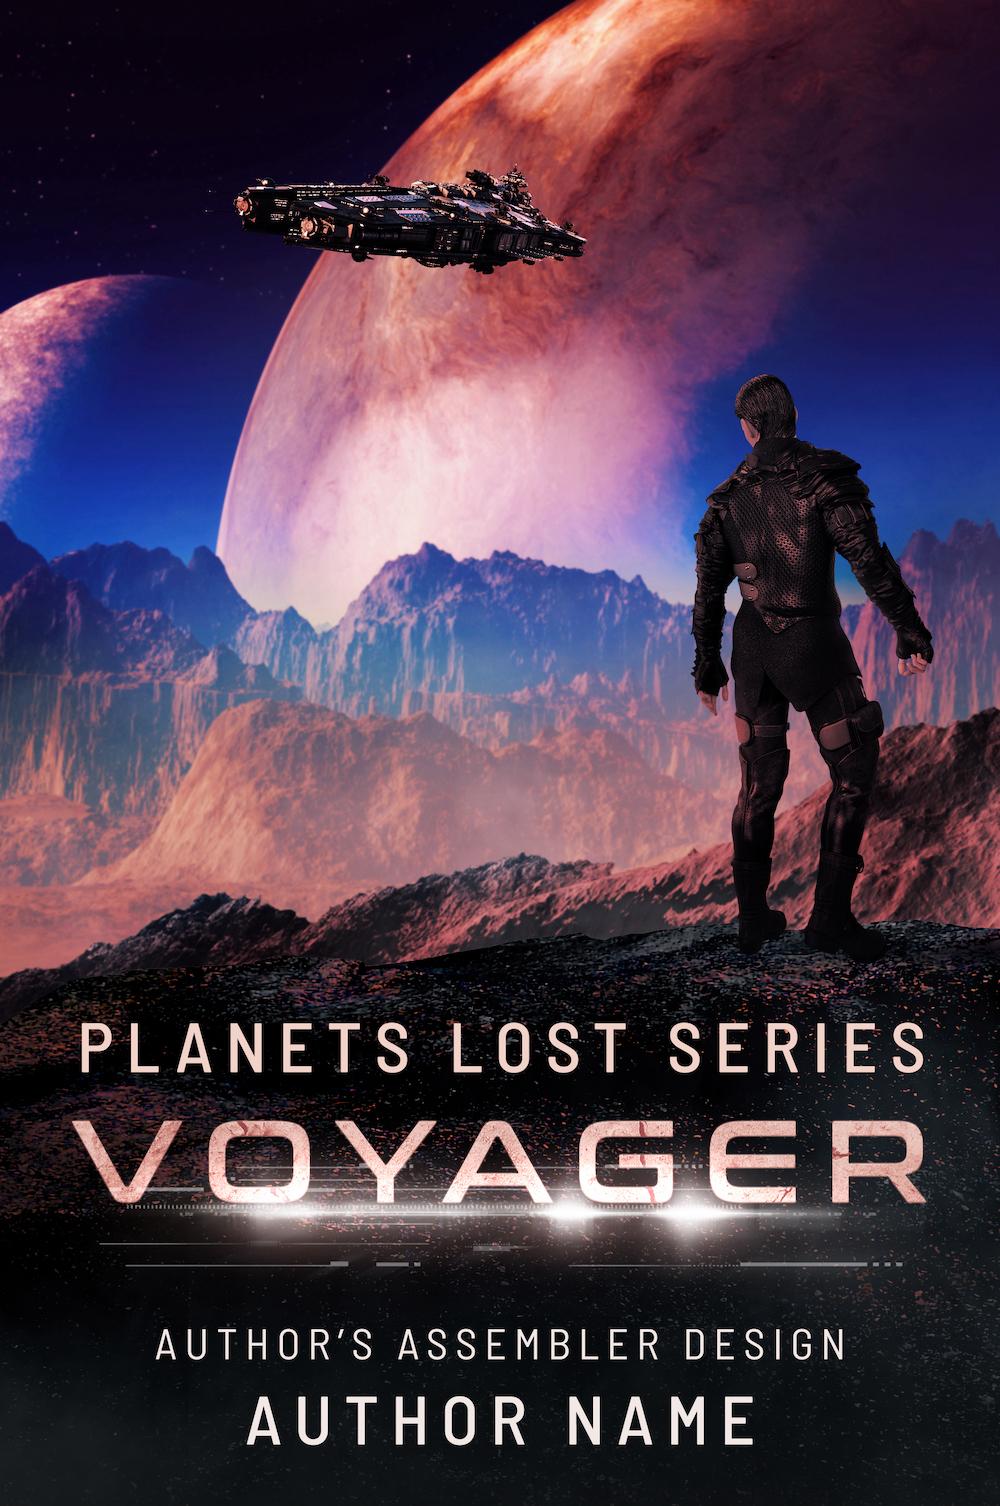 Scifi Premade Cover - Voyager